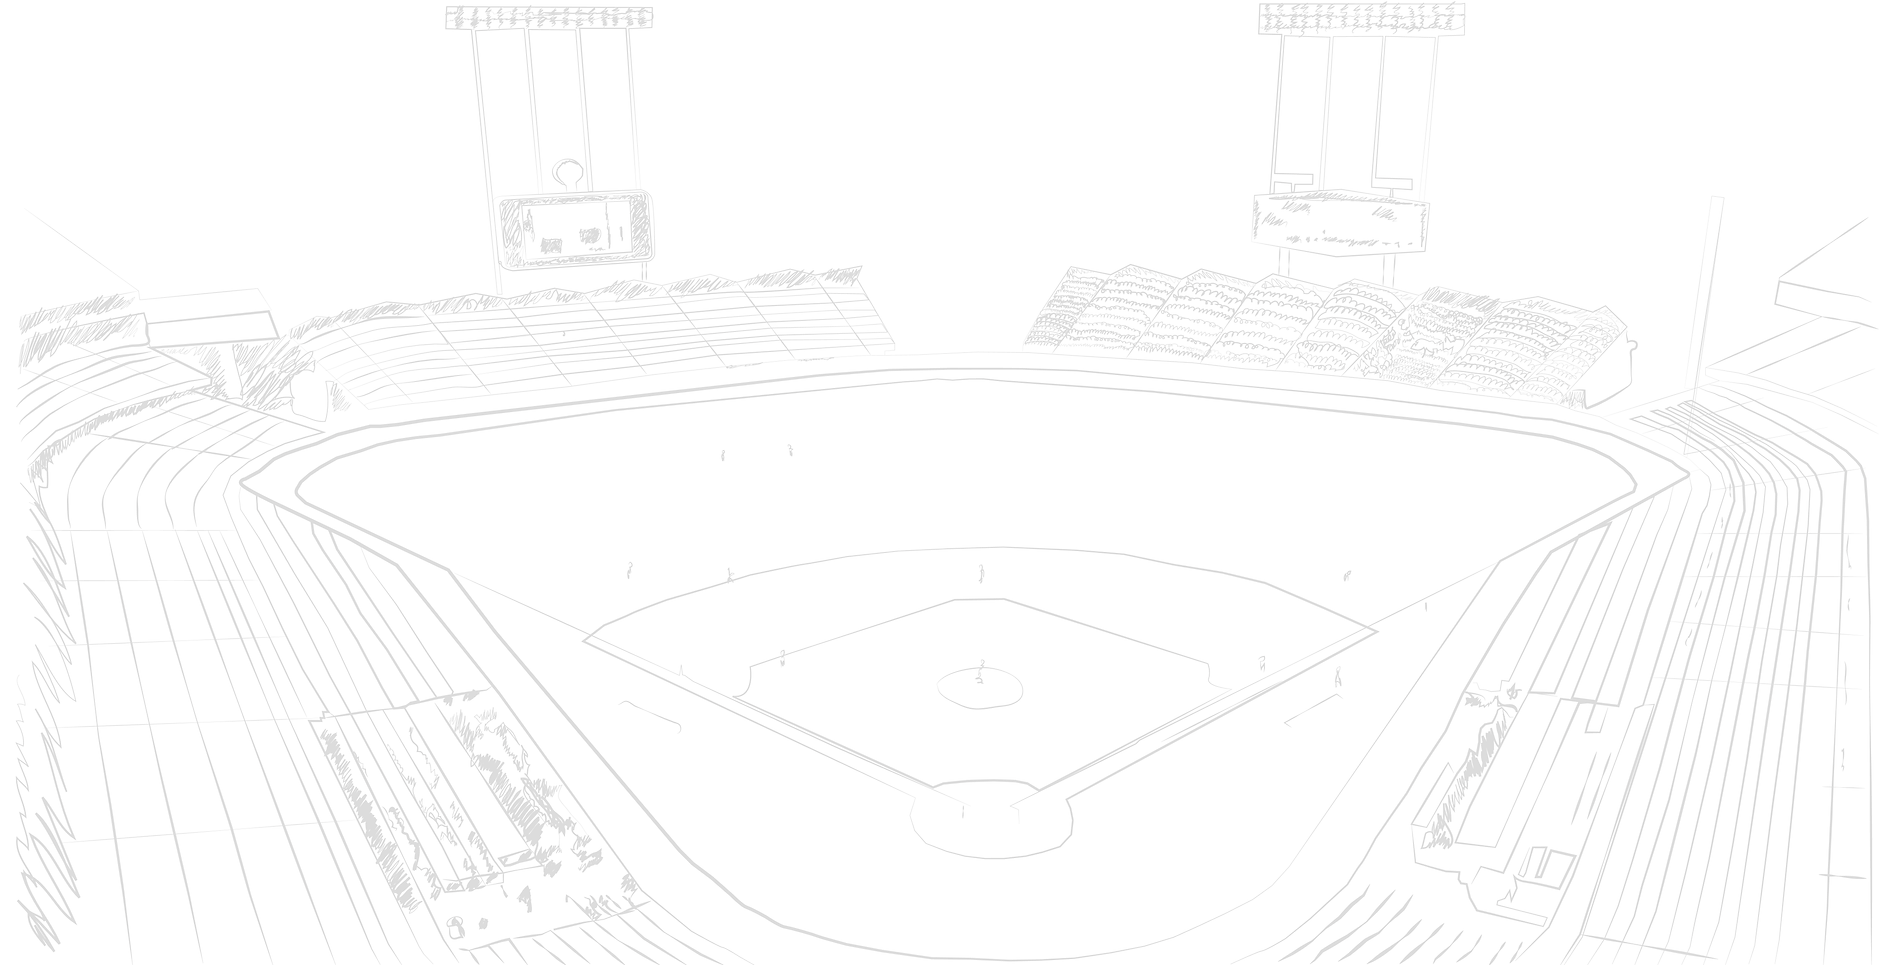 Ballpark Background-01-01.png